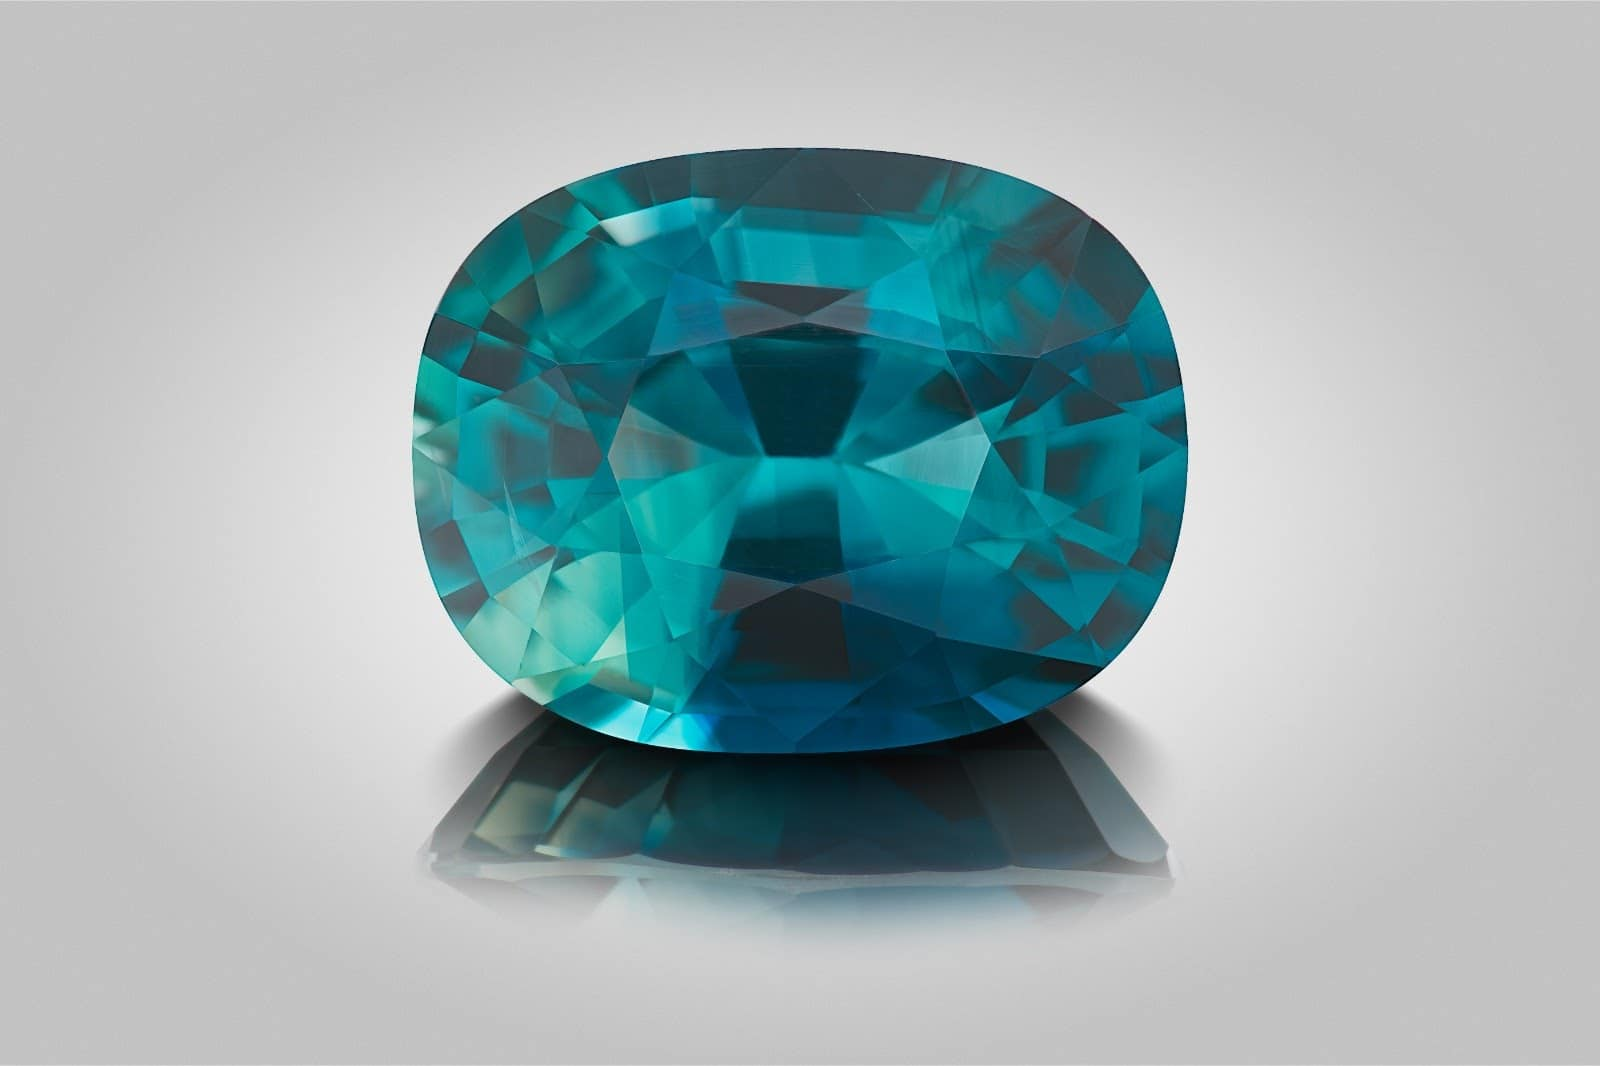 A stunning step cut oval 6.11 carat mermaid sapphire